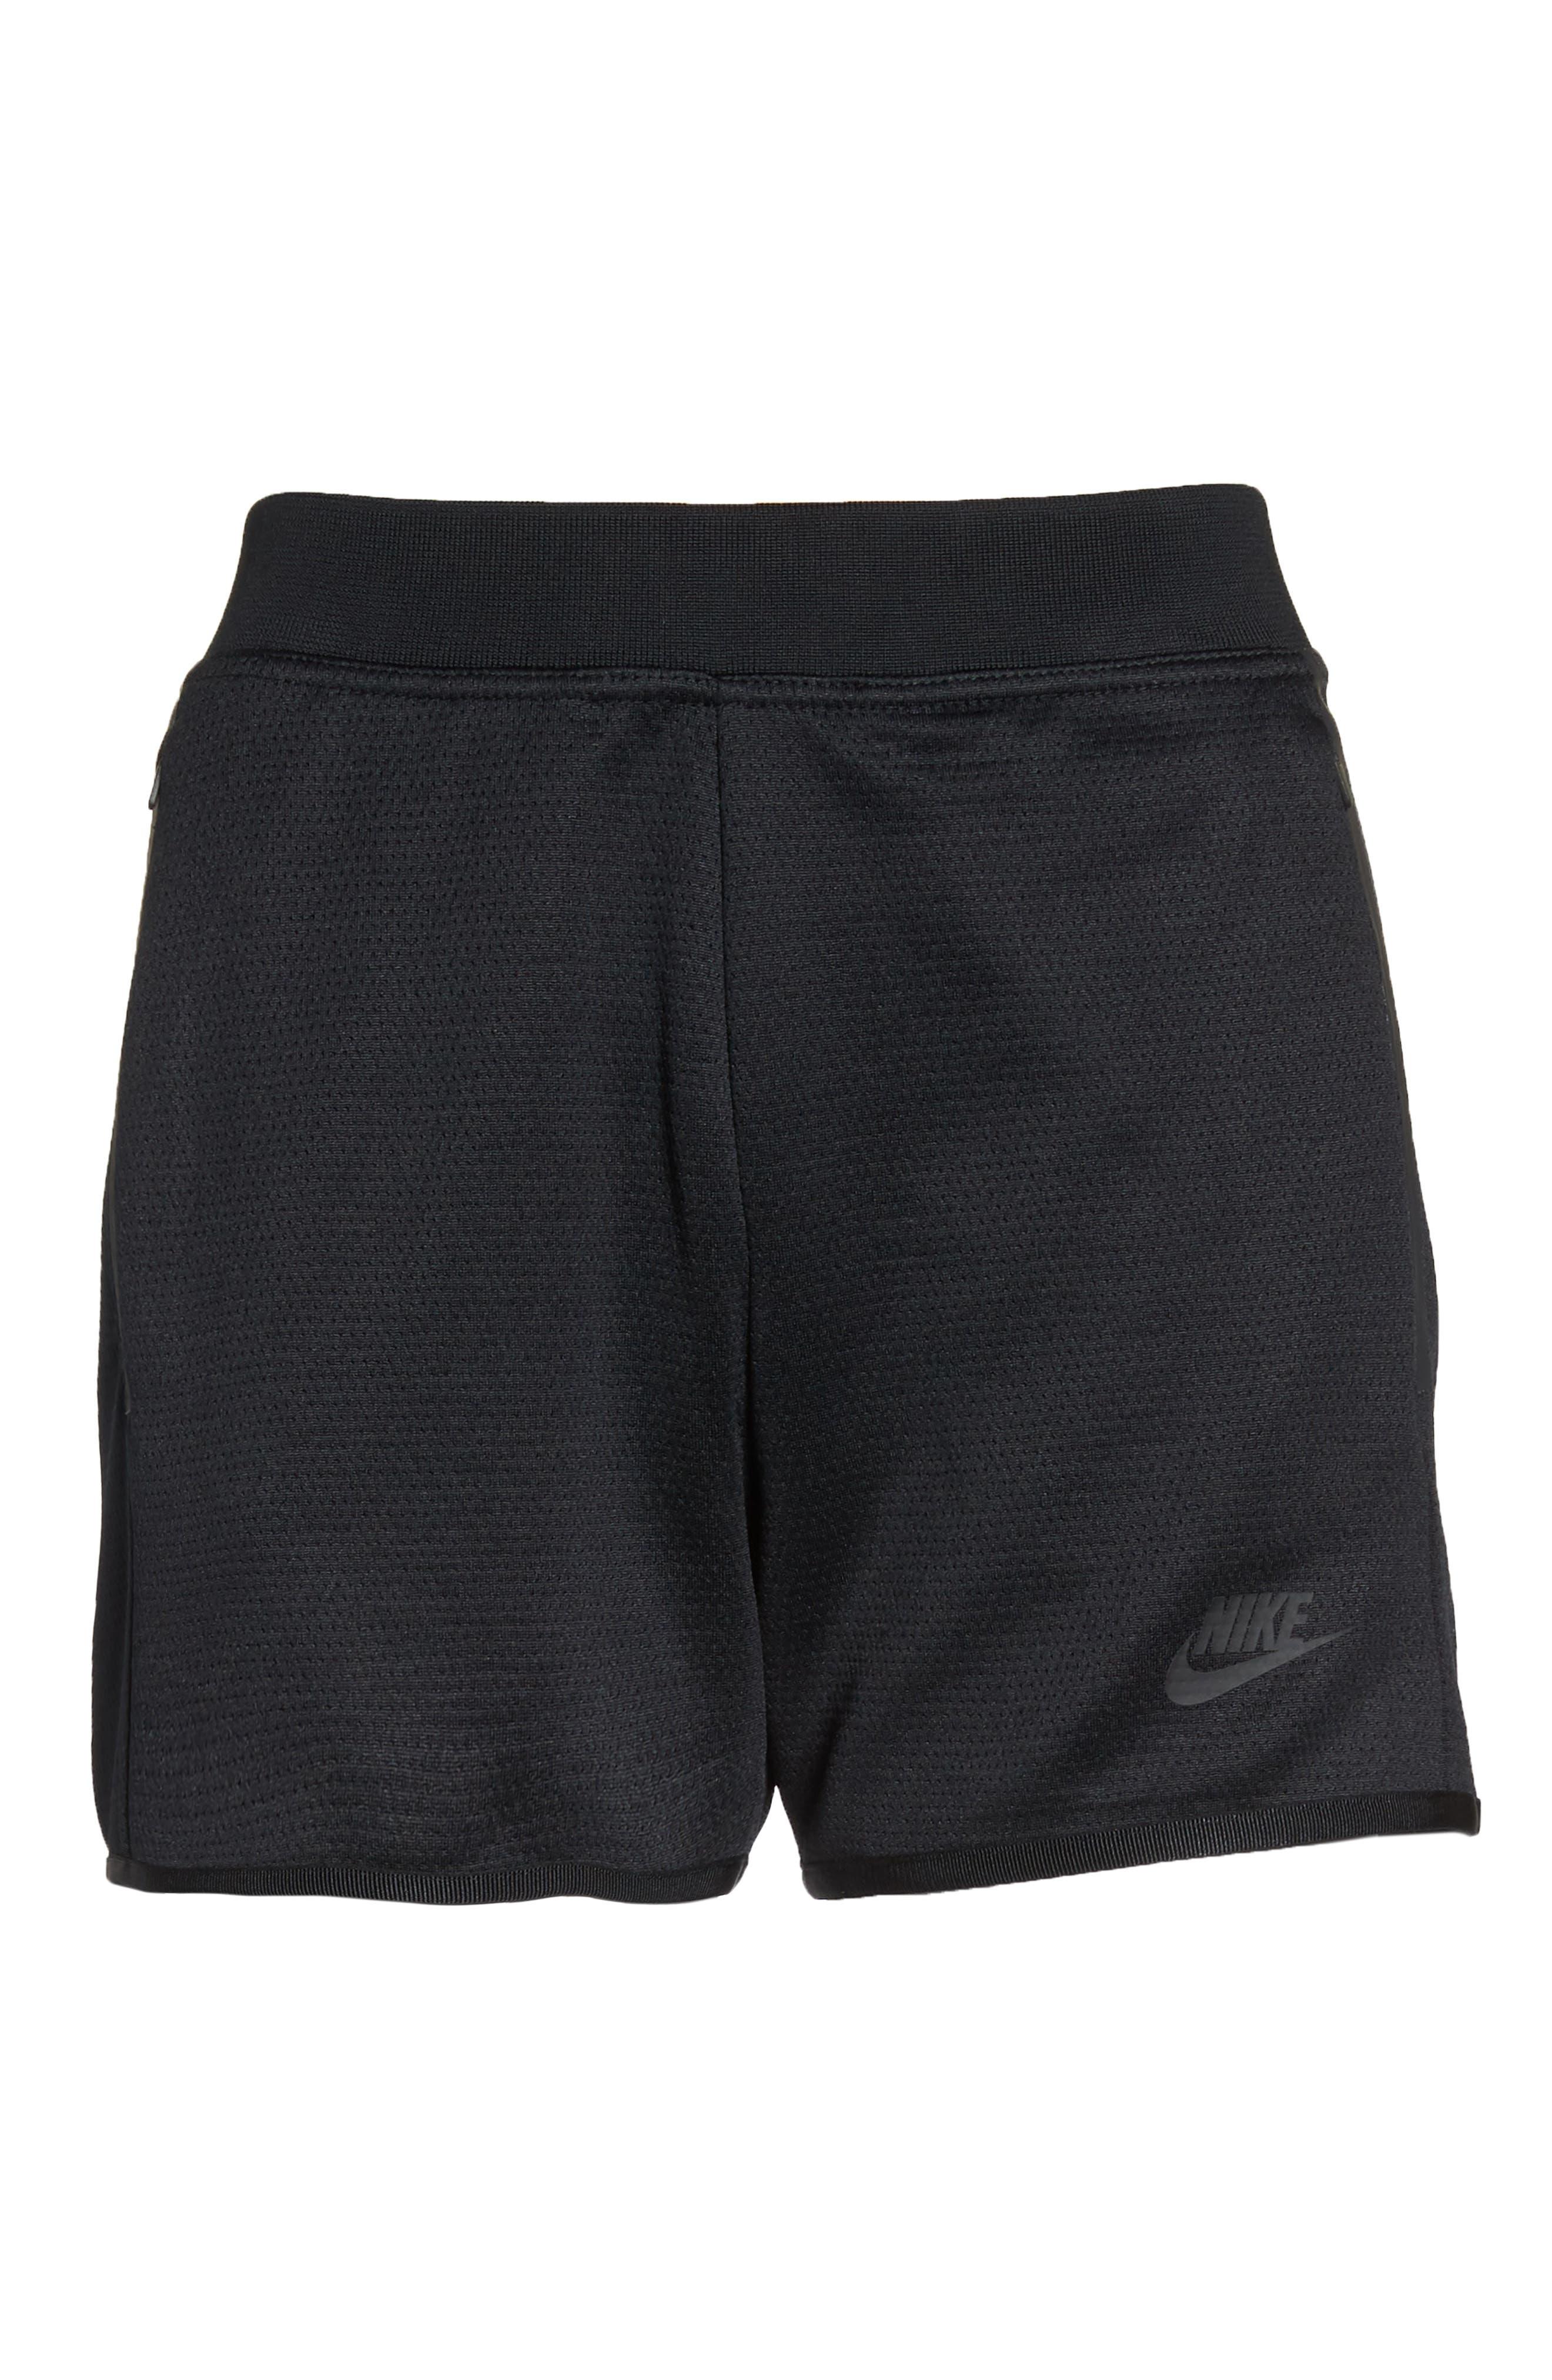 Sportswear Tech Fleece Short,                             Alternate thumbnail 7, color,                             Black/ Black